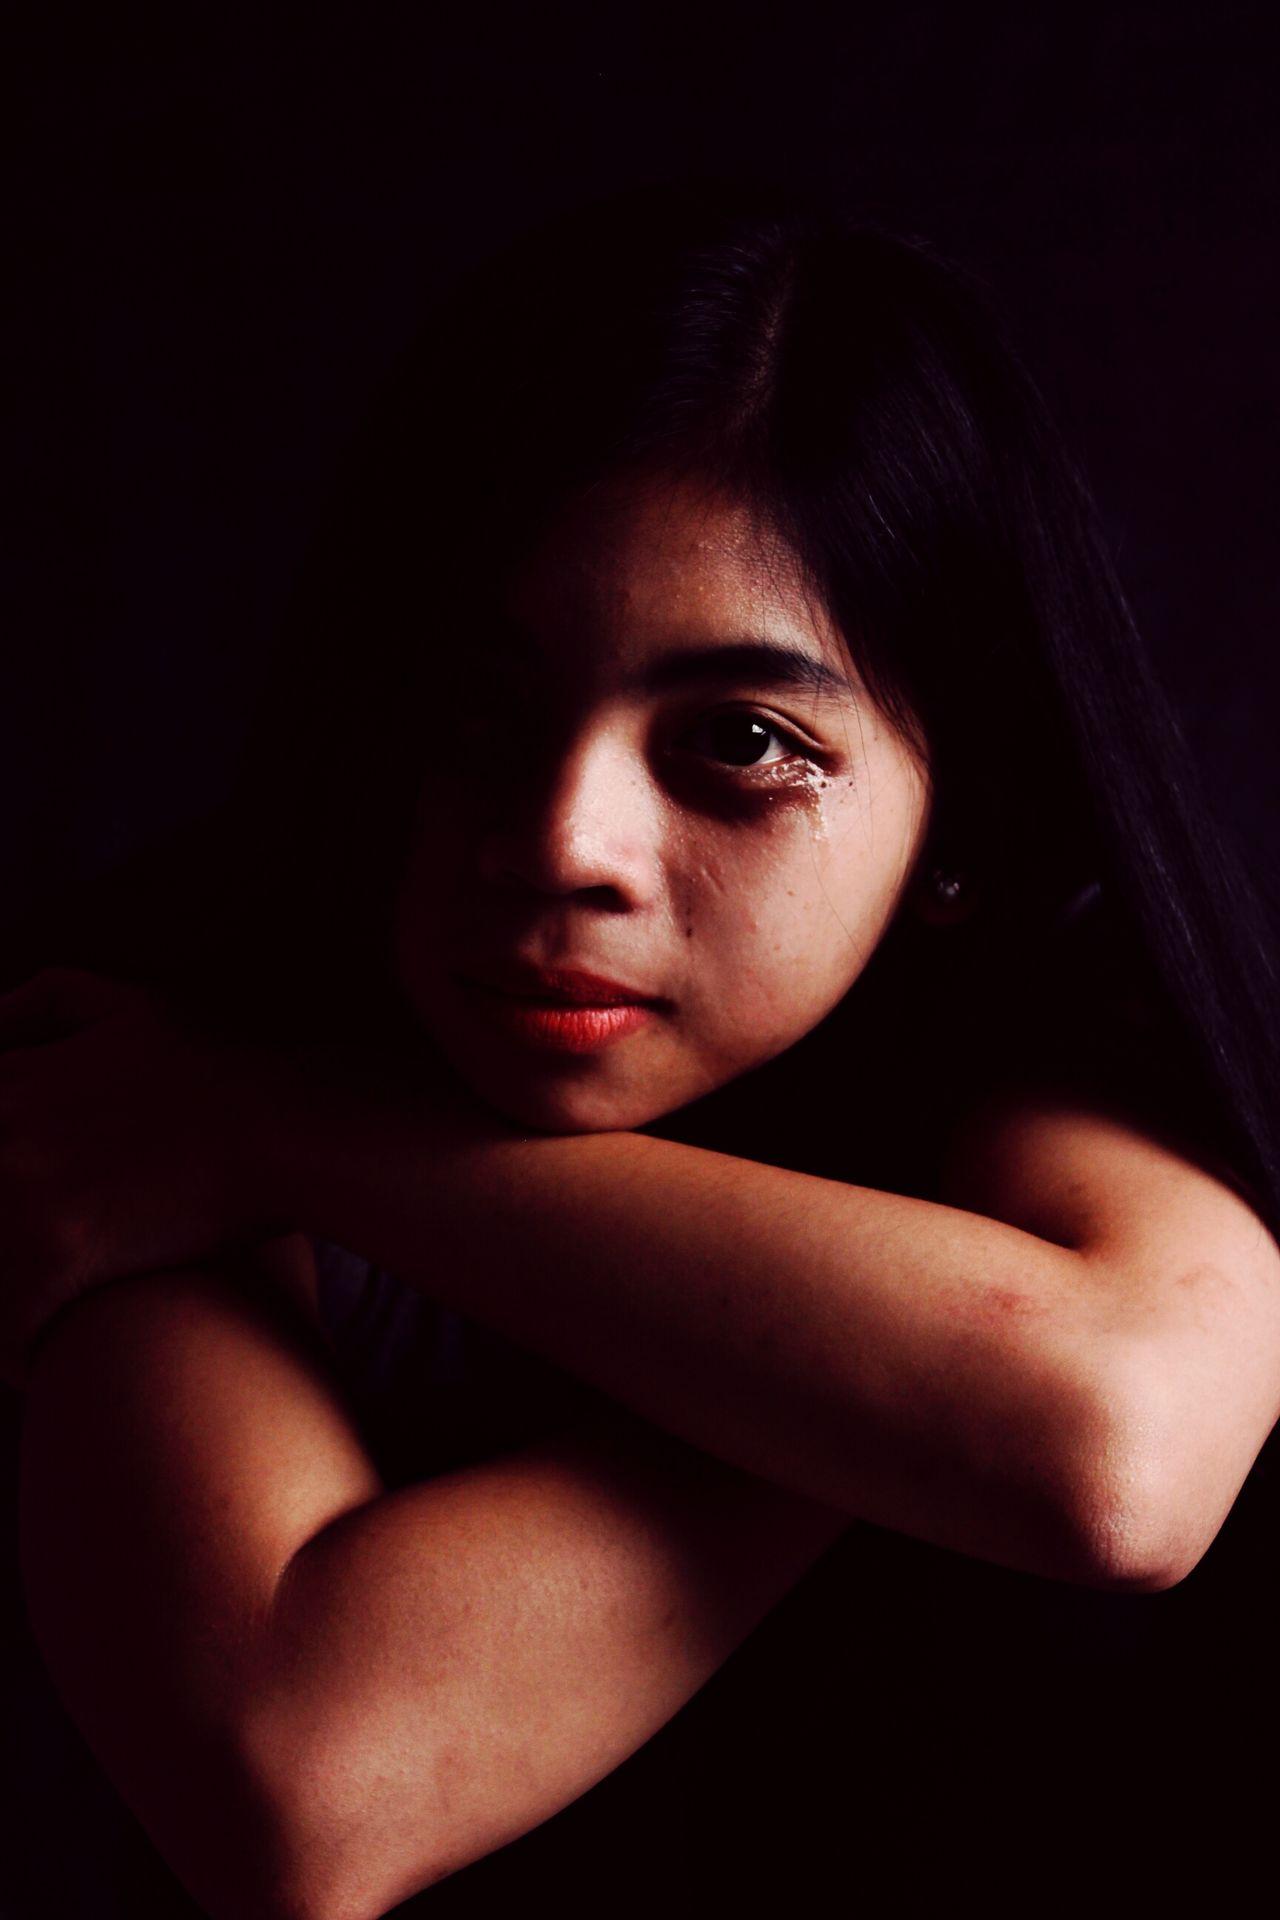 The Potraitist - 2015 EyeEm Awards Eyem Misty Day Broken Heart Broken Beauty Broken Dreams Brokendreams Lost In Thought... Hopeless Sadbeautifultragic Sad & Lonely Black Shades Black Color Timorense TIMORLESTEBrito